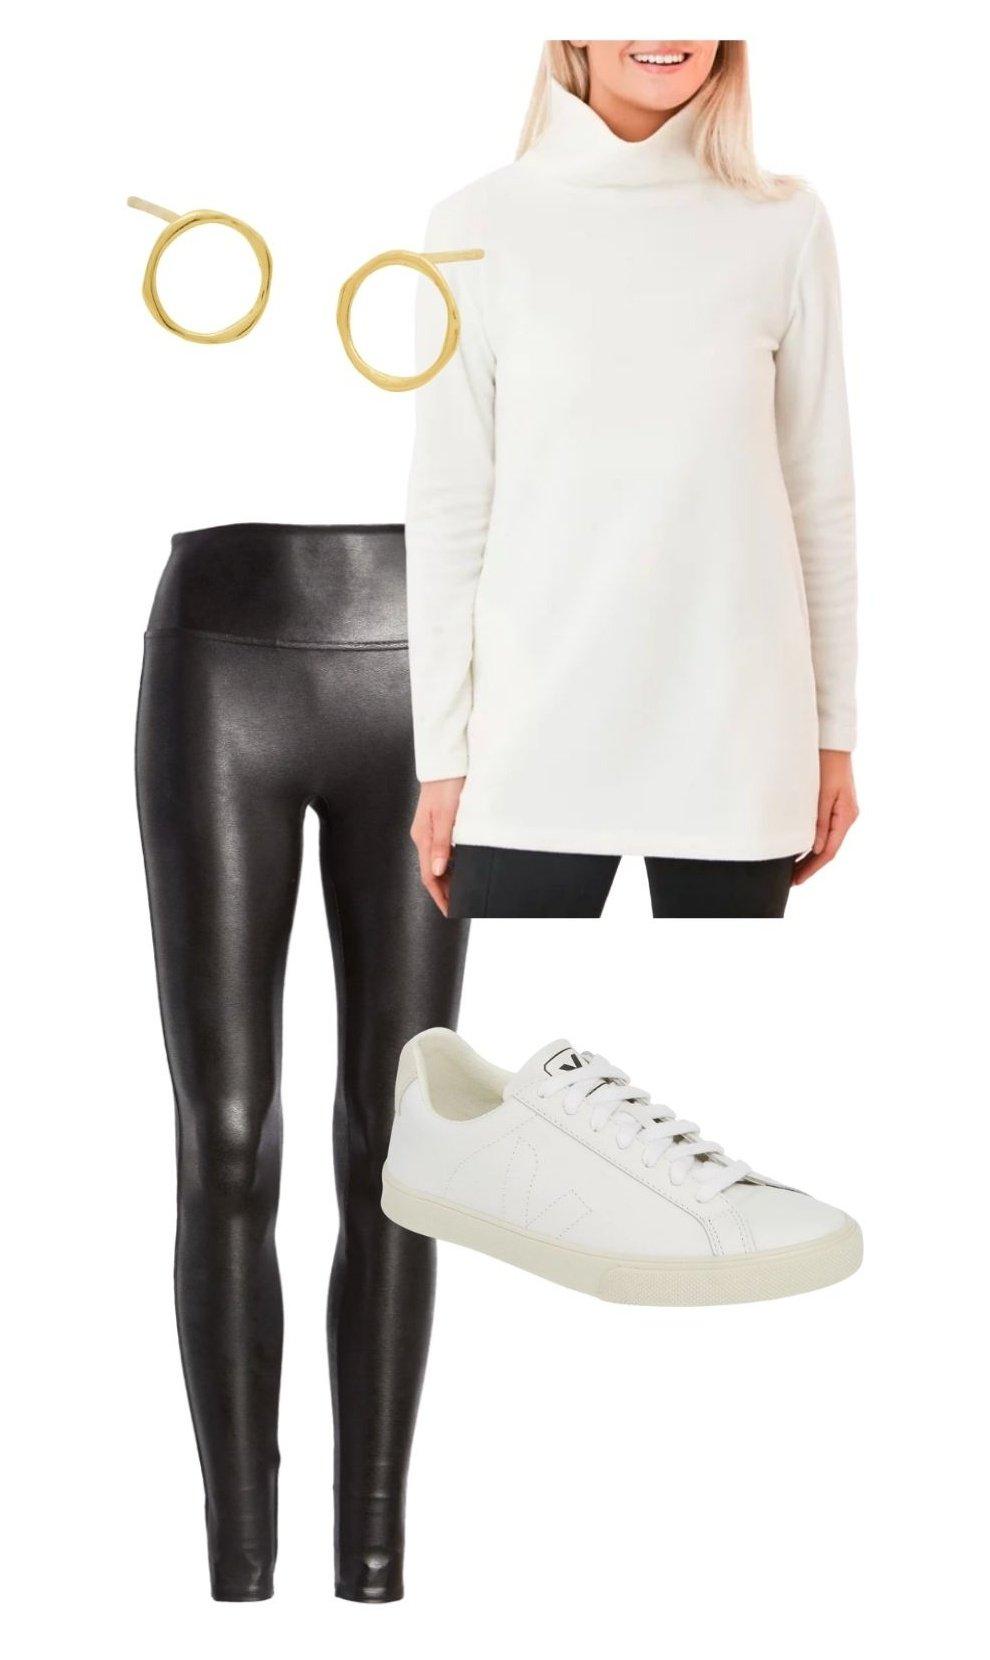 spanx leggings outfit idea